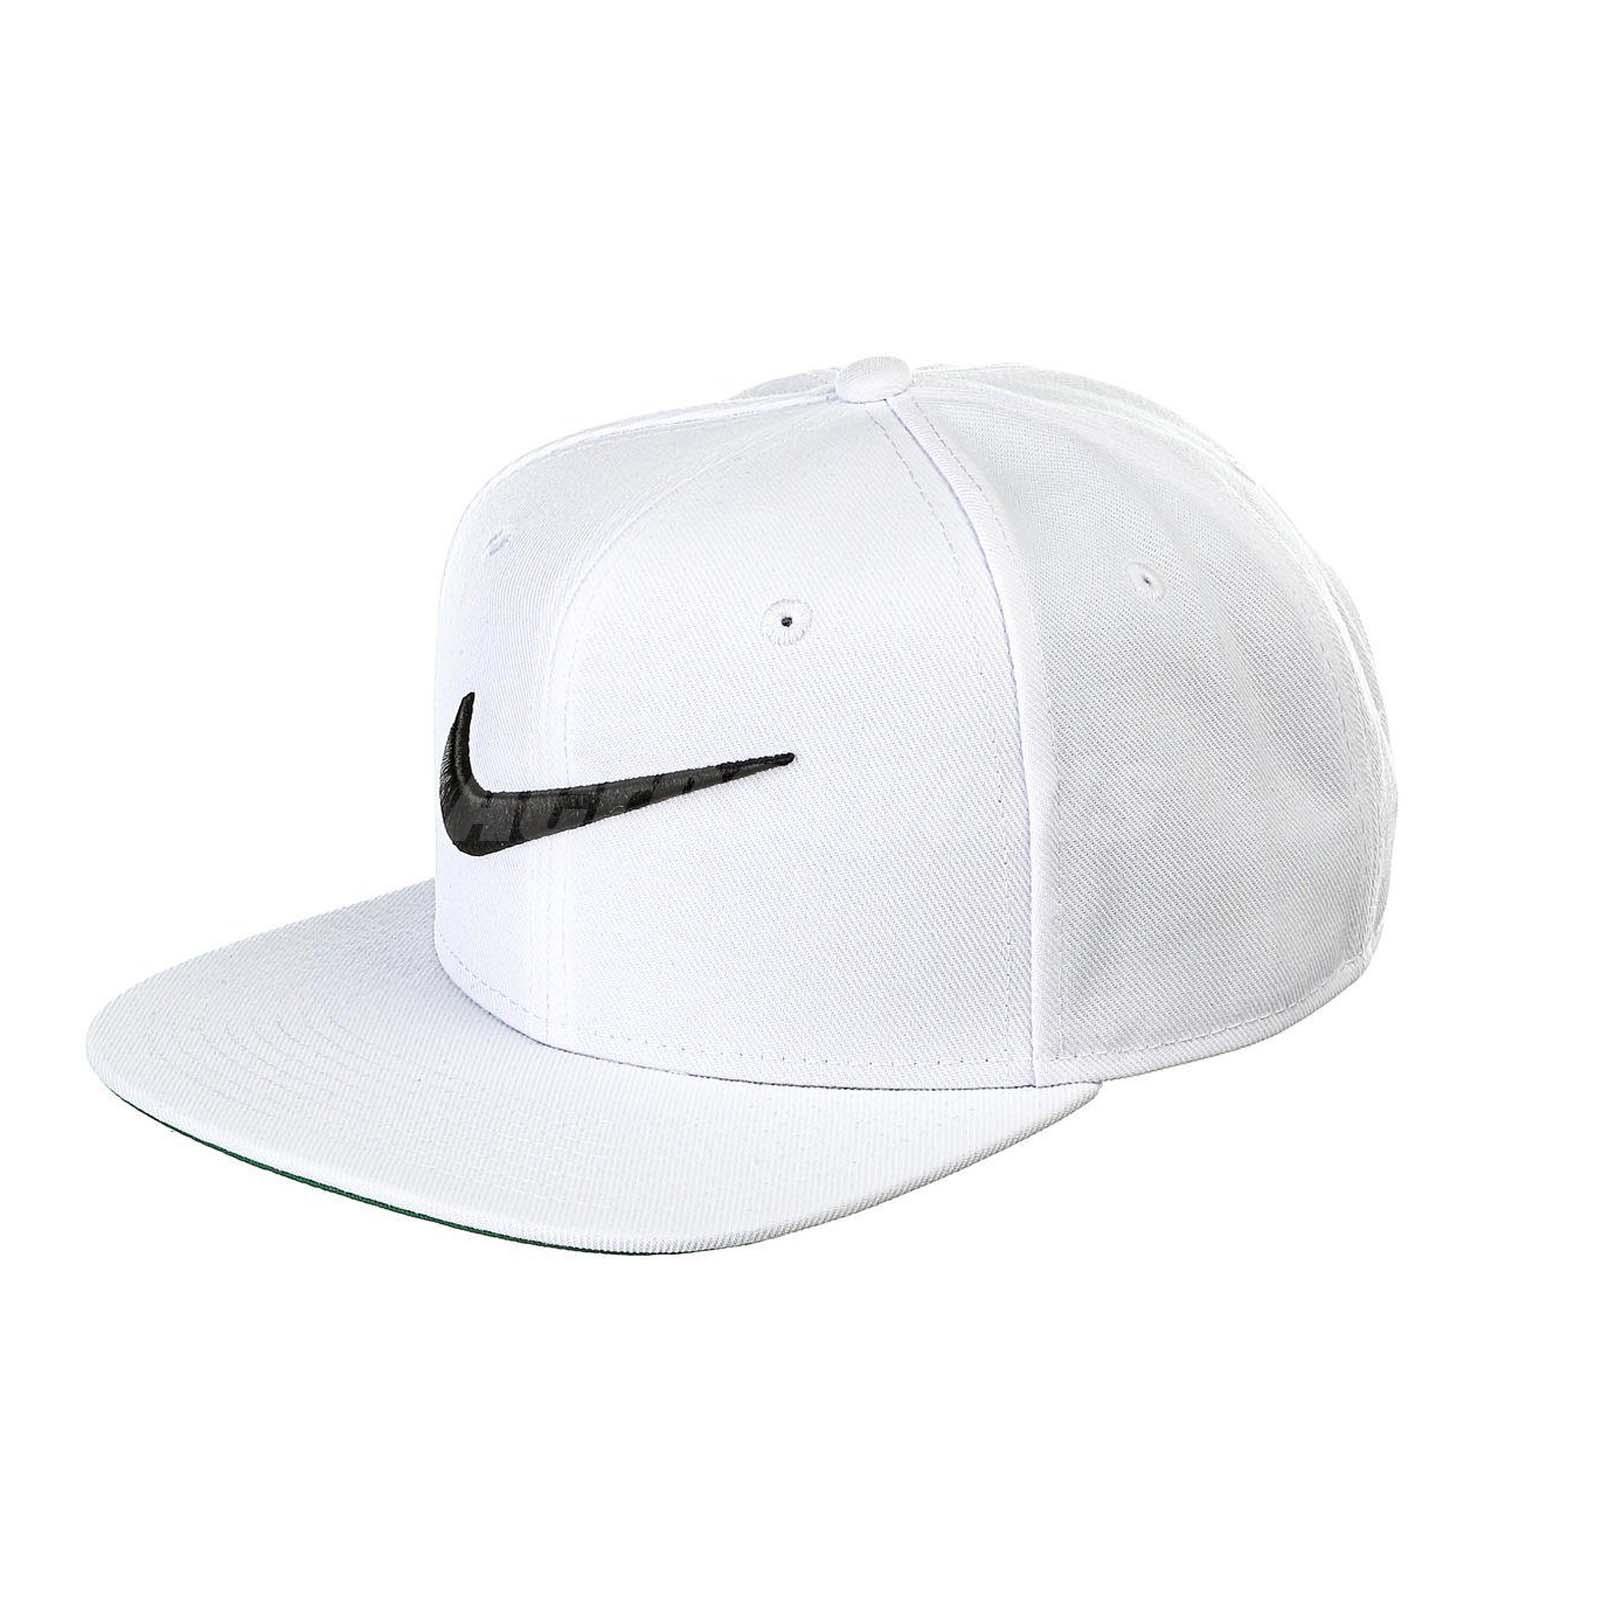 Nike Swoosh Pro White Black Embroidery Snapback Adjustable Hat Sports  639534-100 e12c07085a8